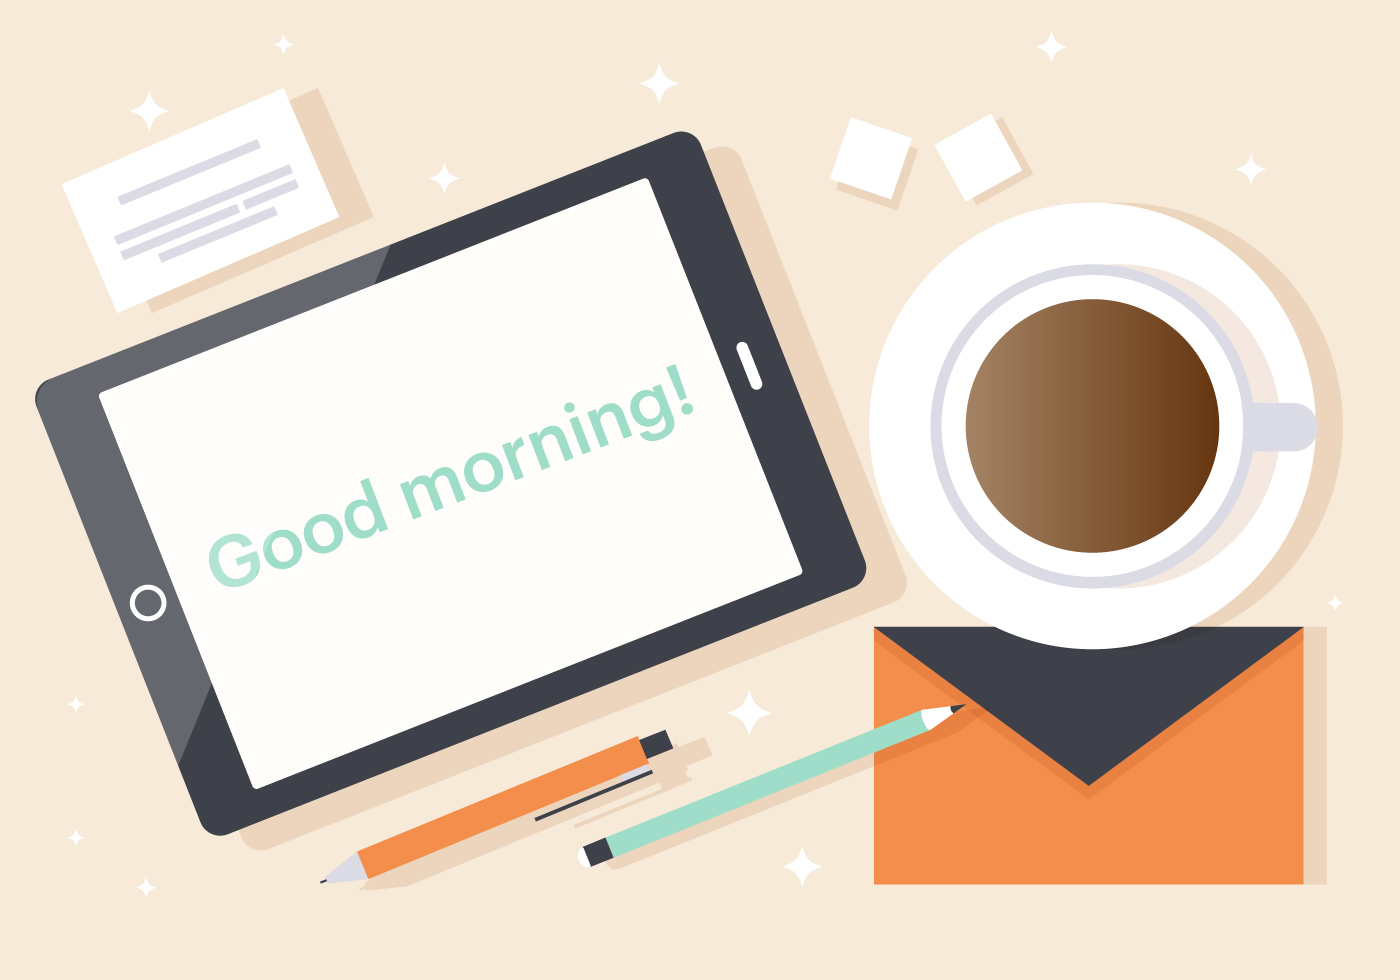 Good Morning Tablet Vector Illustration Download Free